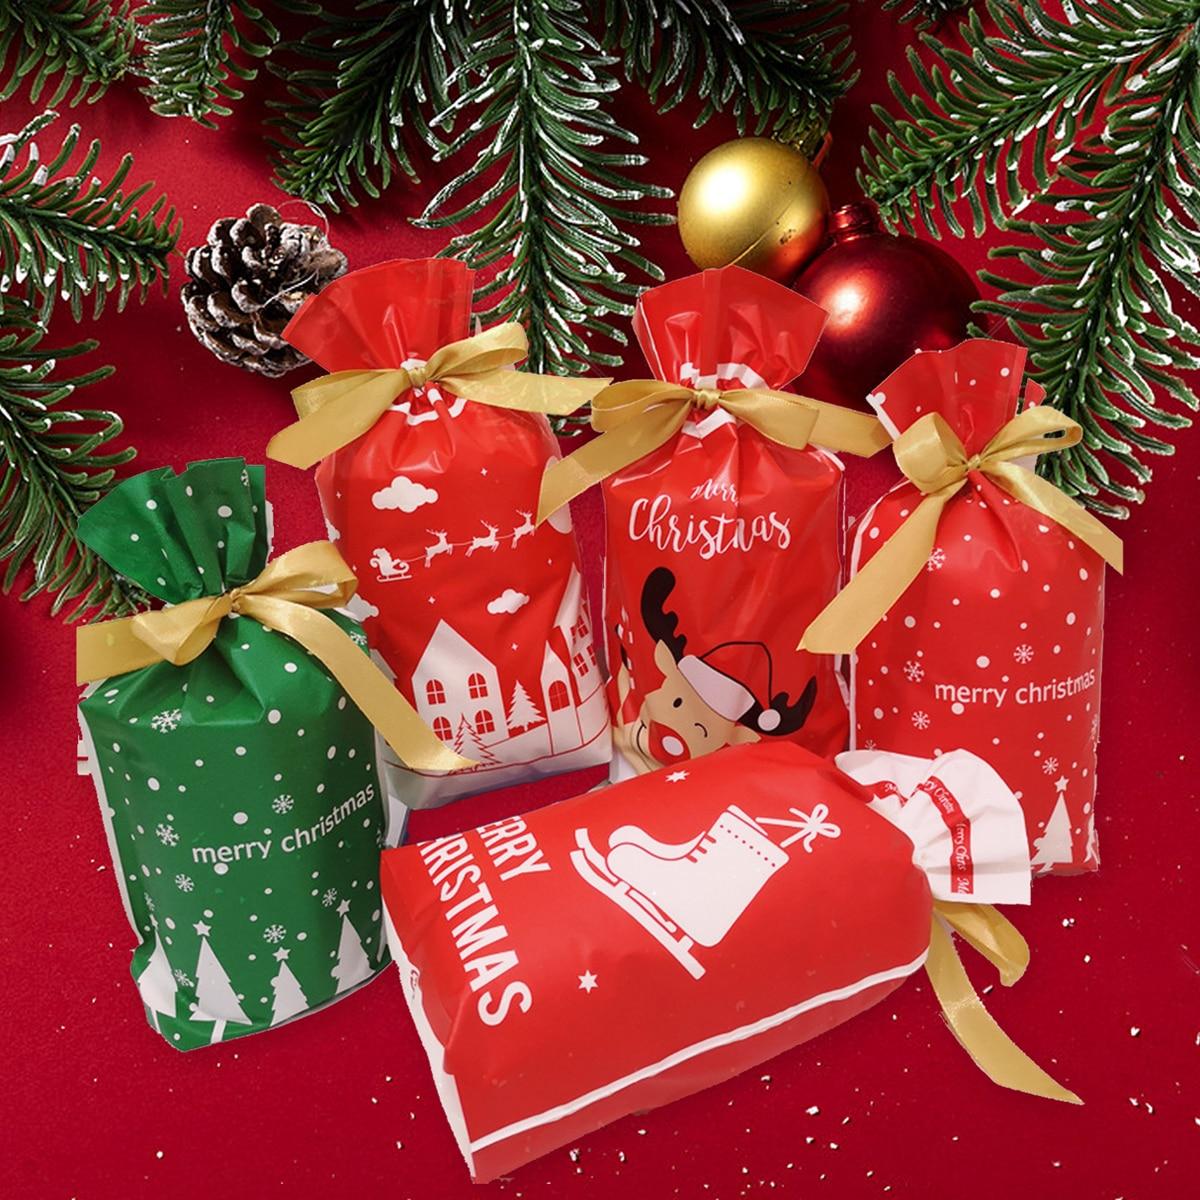 5шт Сумка с рождественским узором подарок